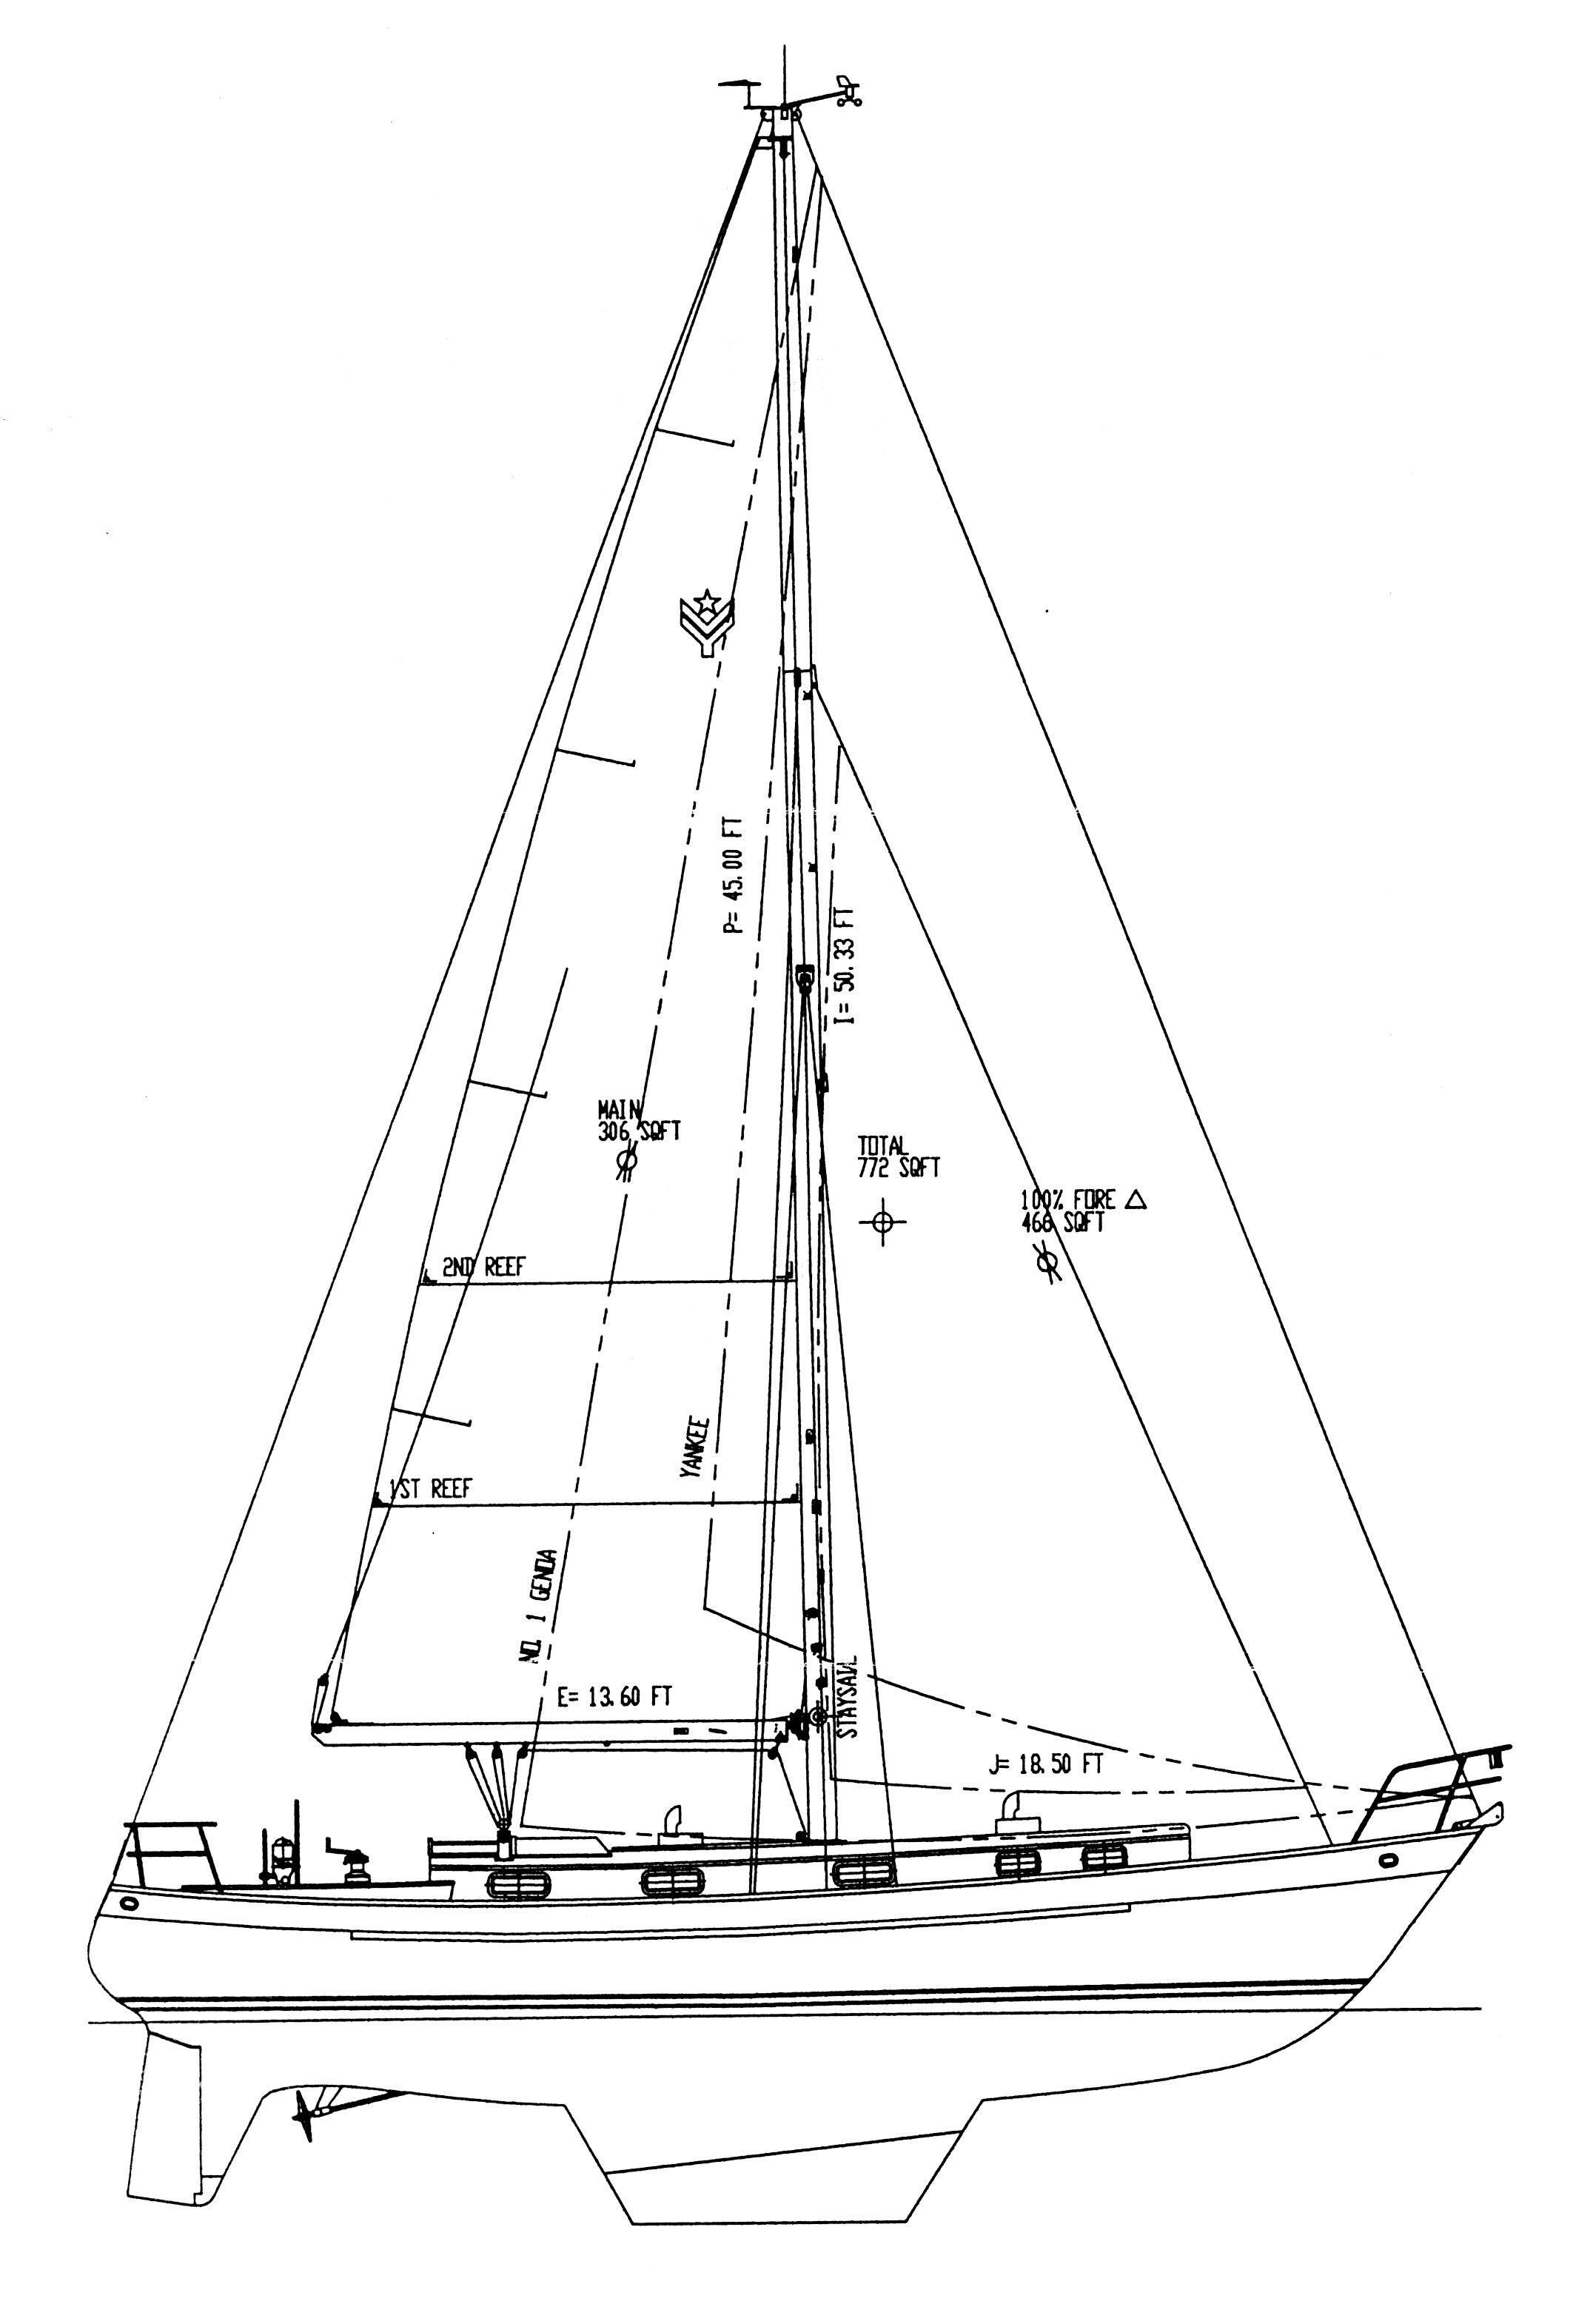 Syzygy Sailing The Boat